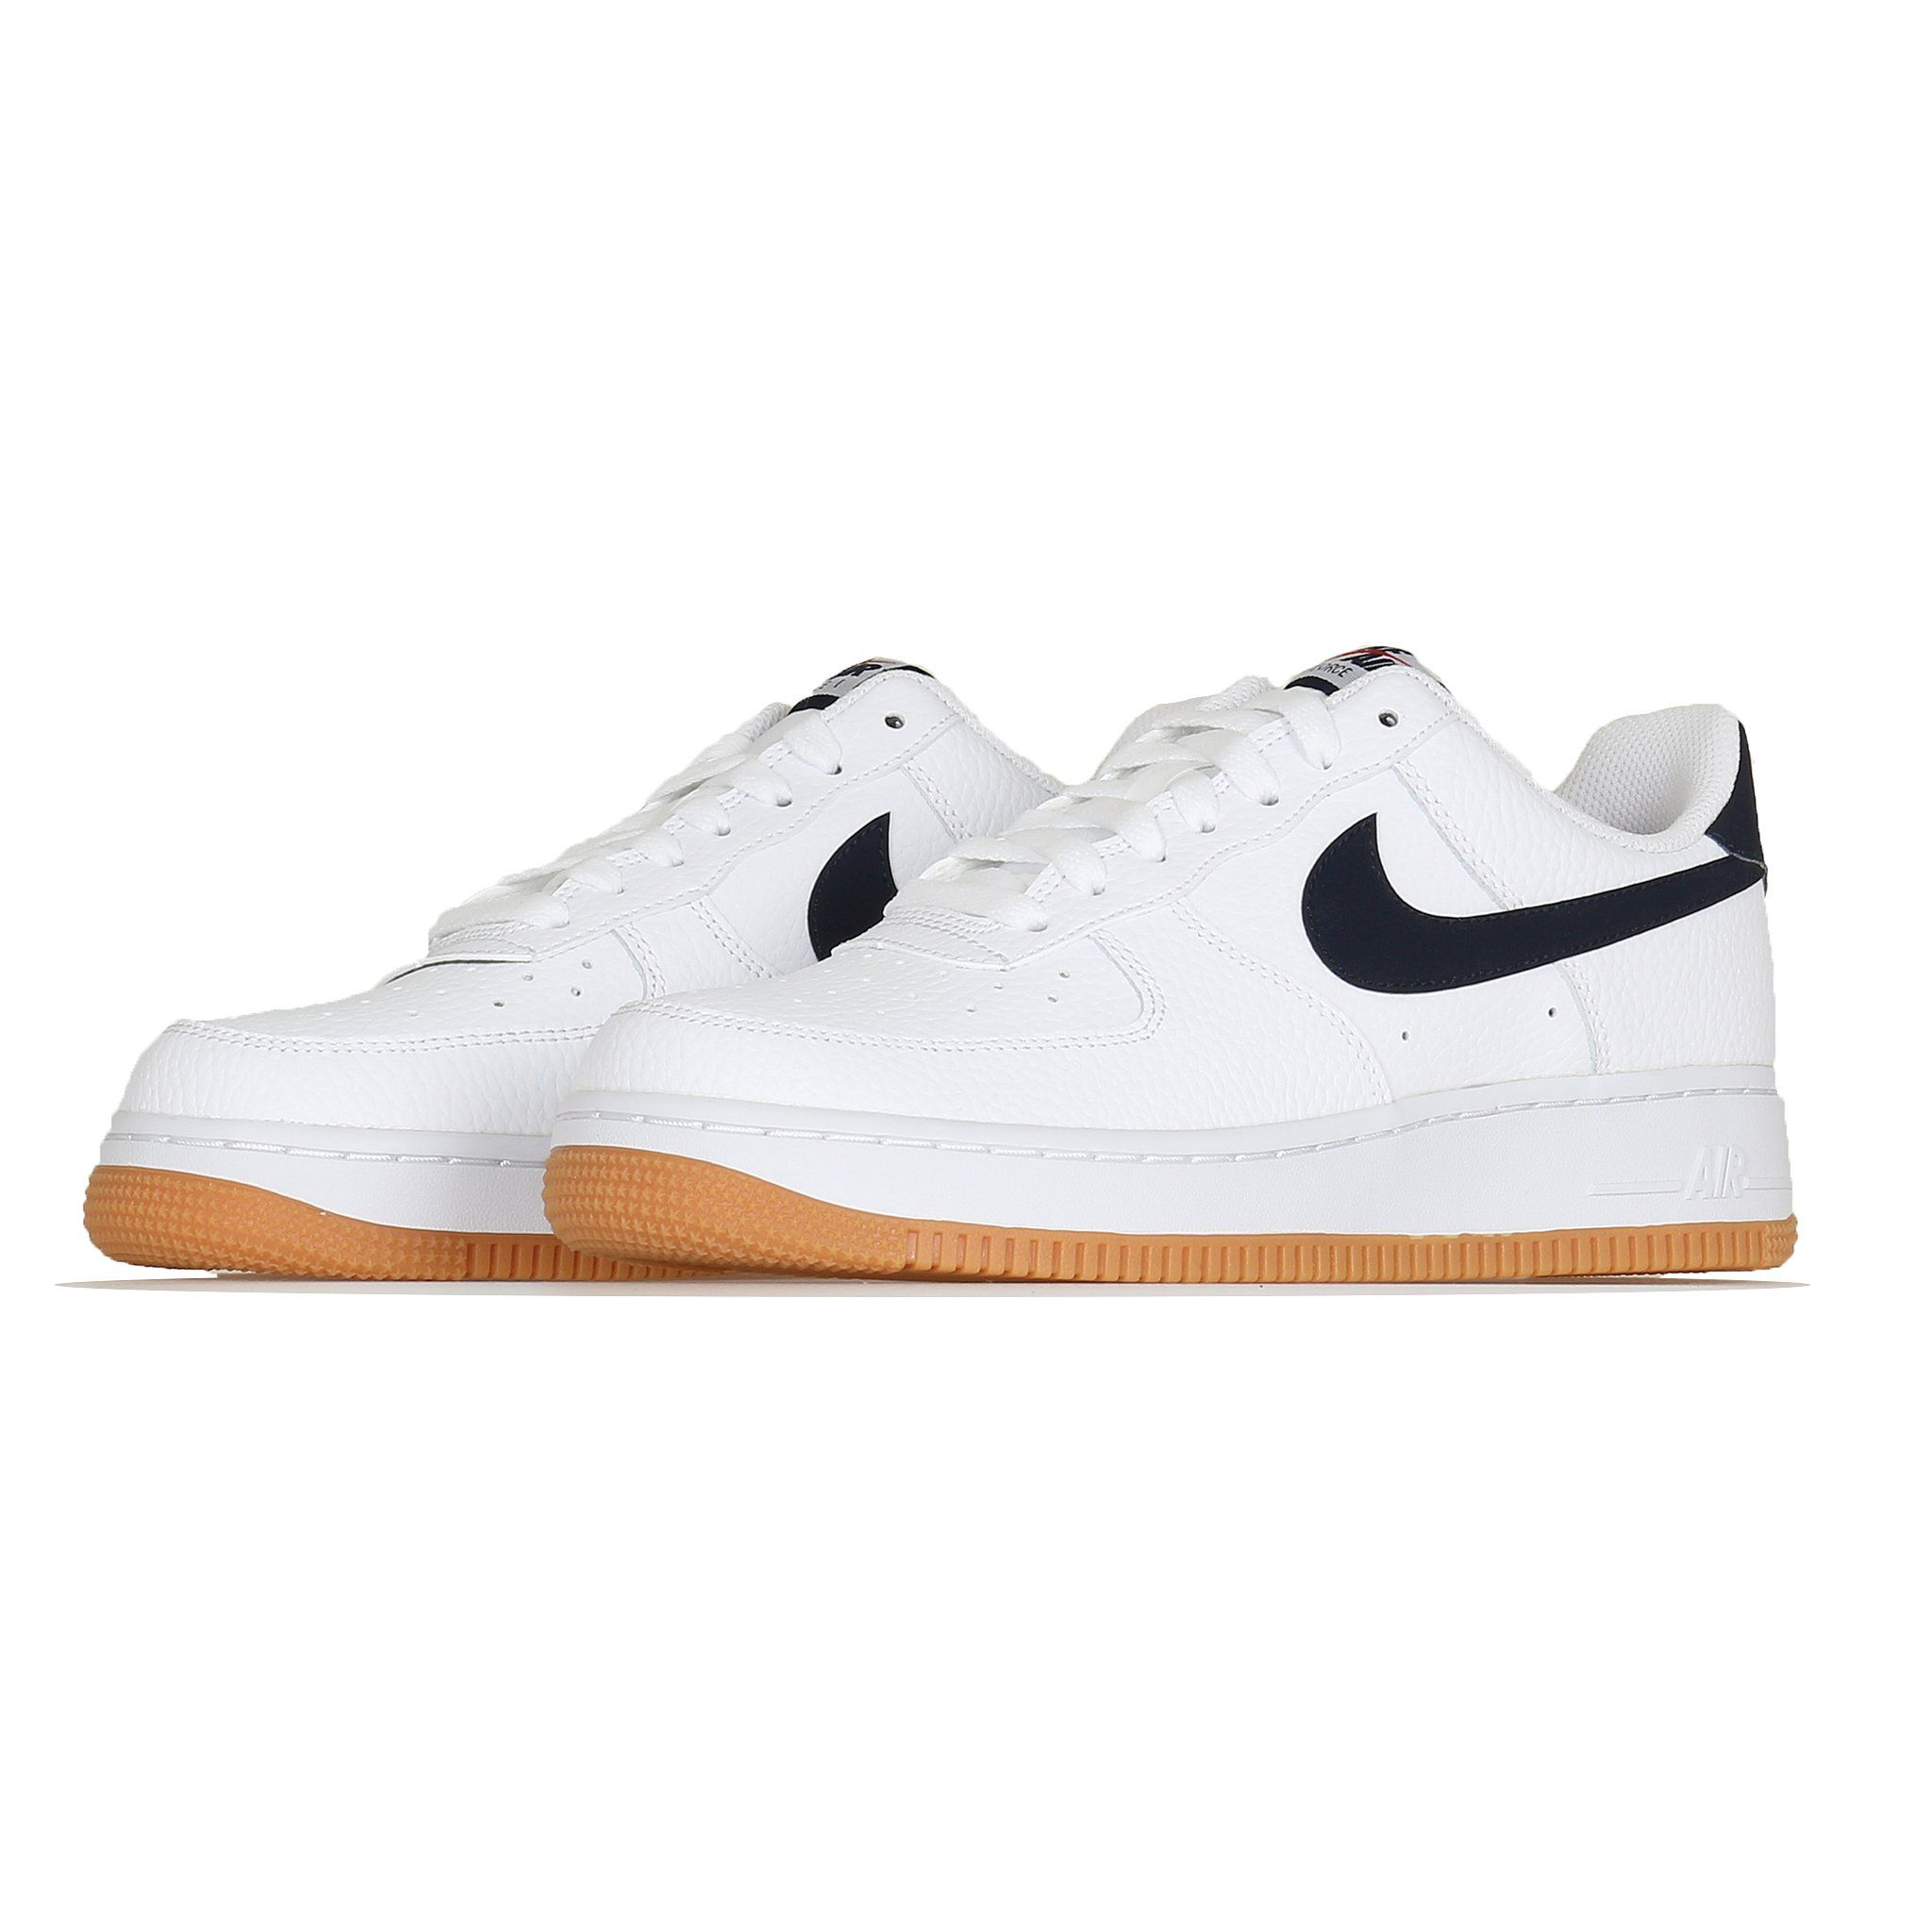 Nike Air Force 1 '07 WhiteObsidian